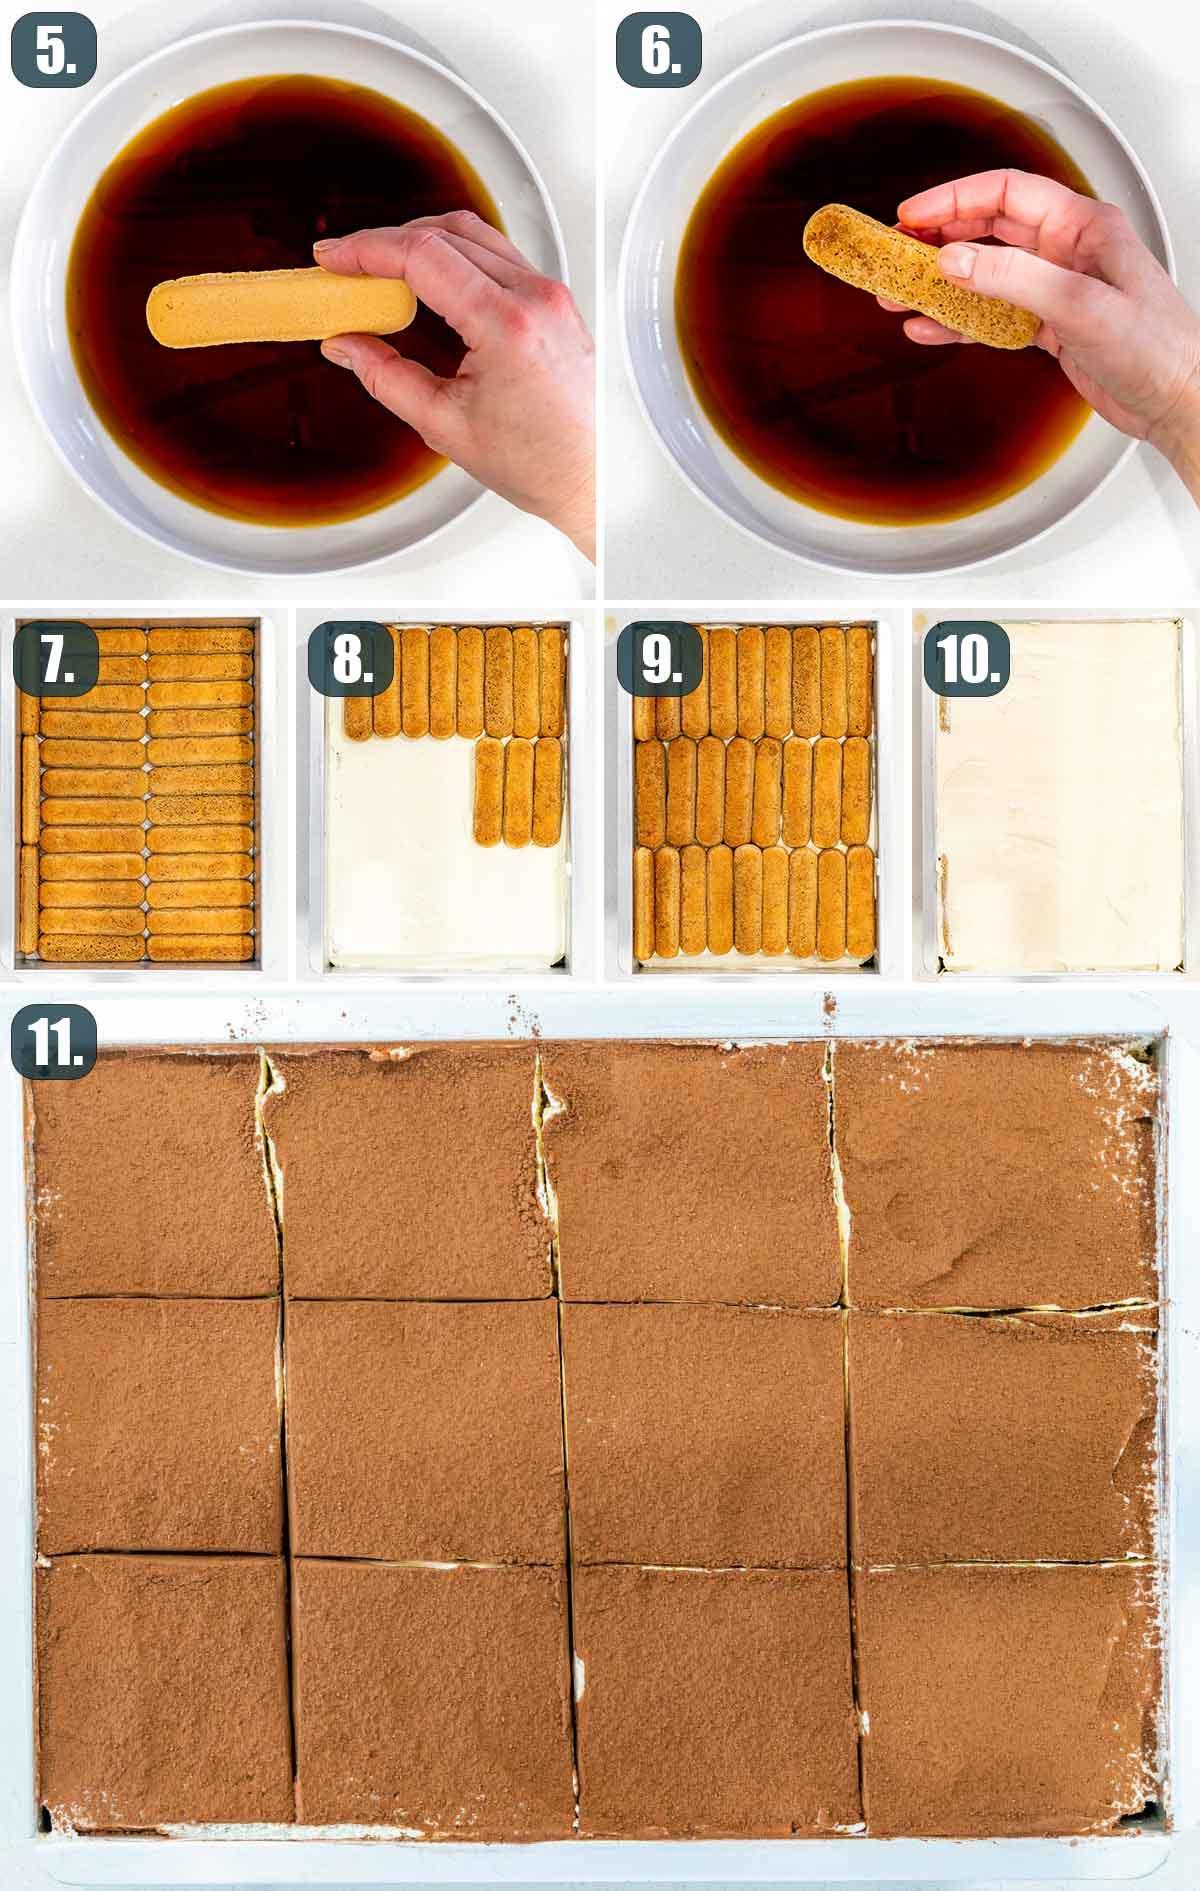 process shots showing how to assemble tiramisu.